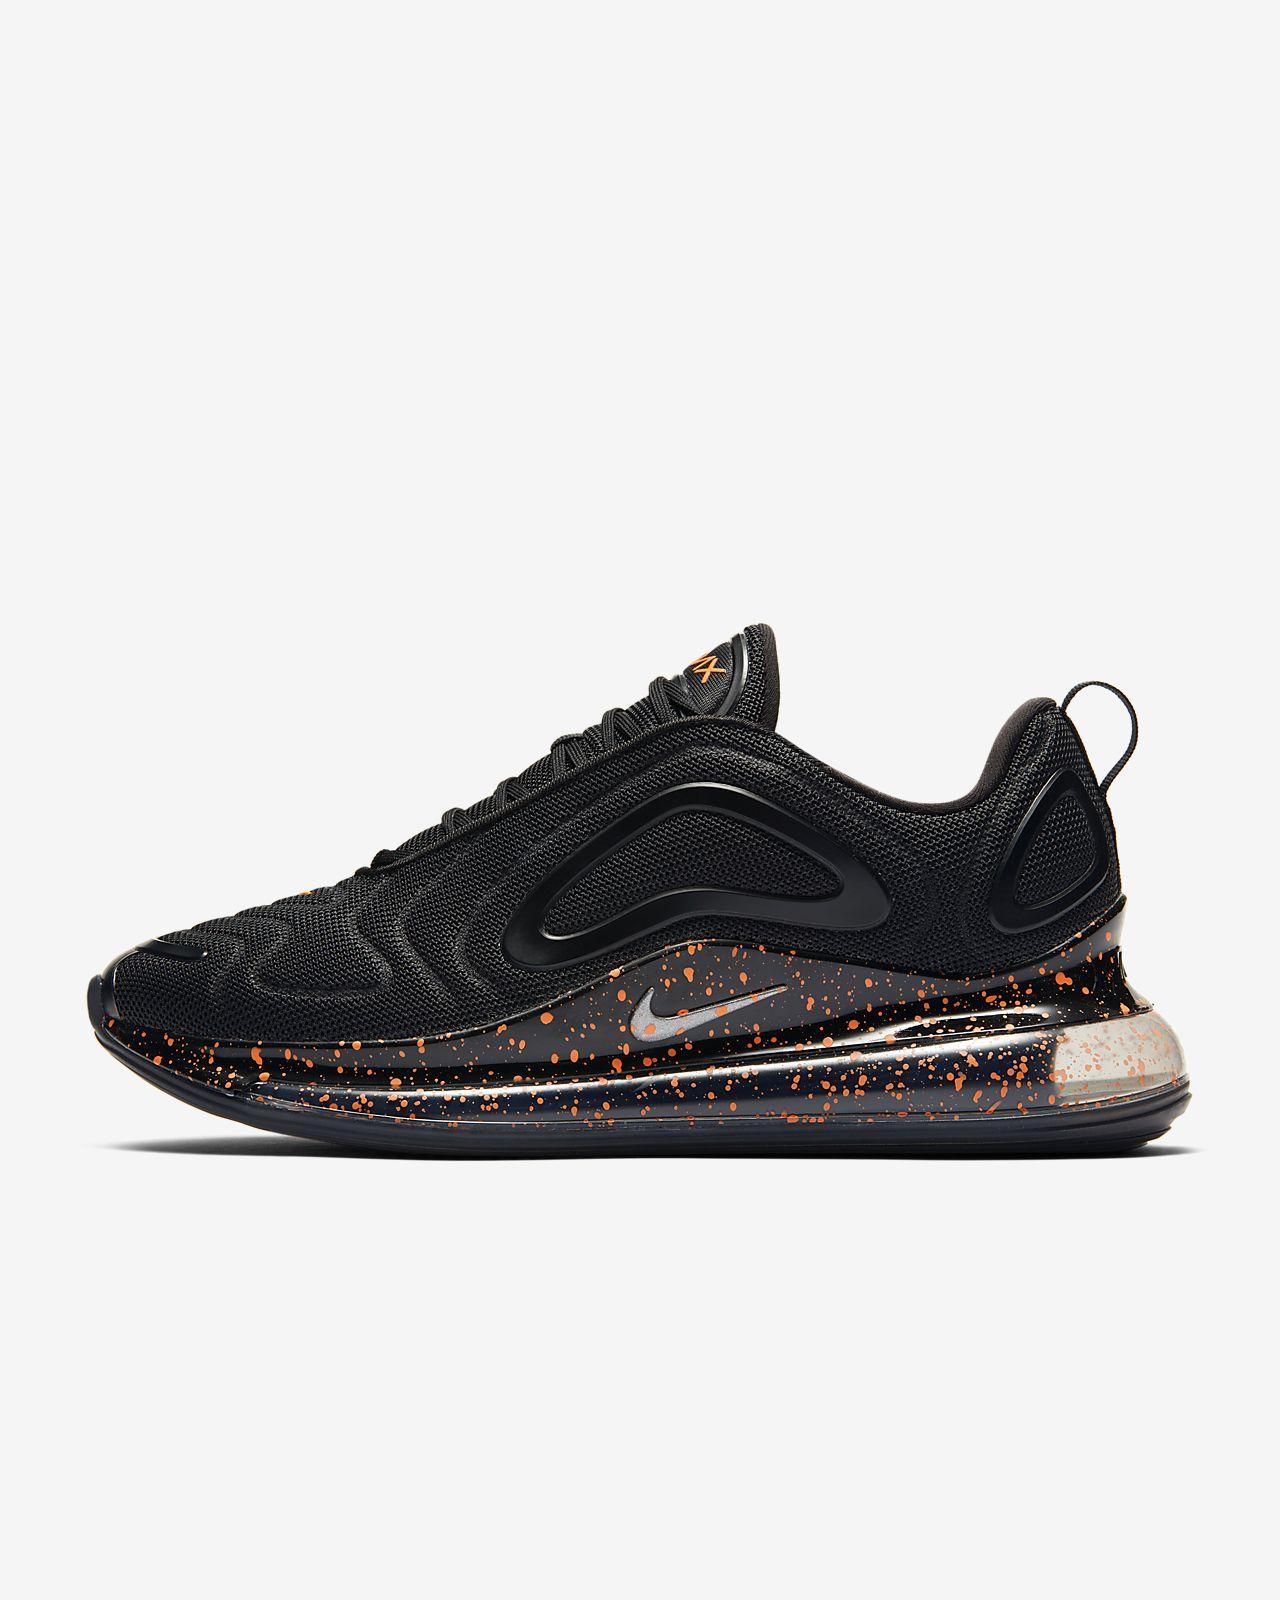 Pour Chaussure 720 Nike Air Max Homme TlKF1Jc3